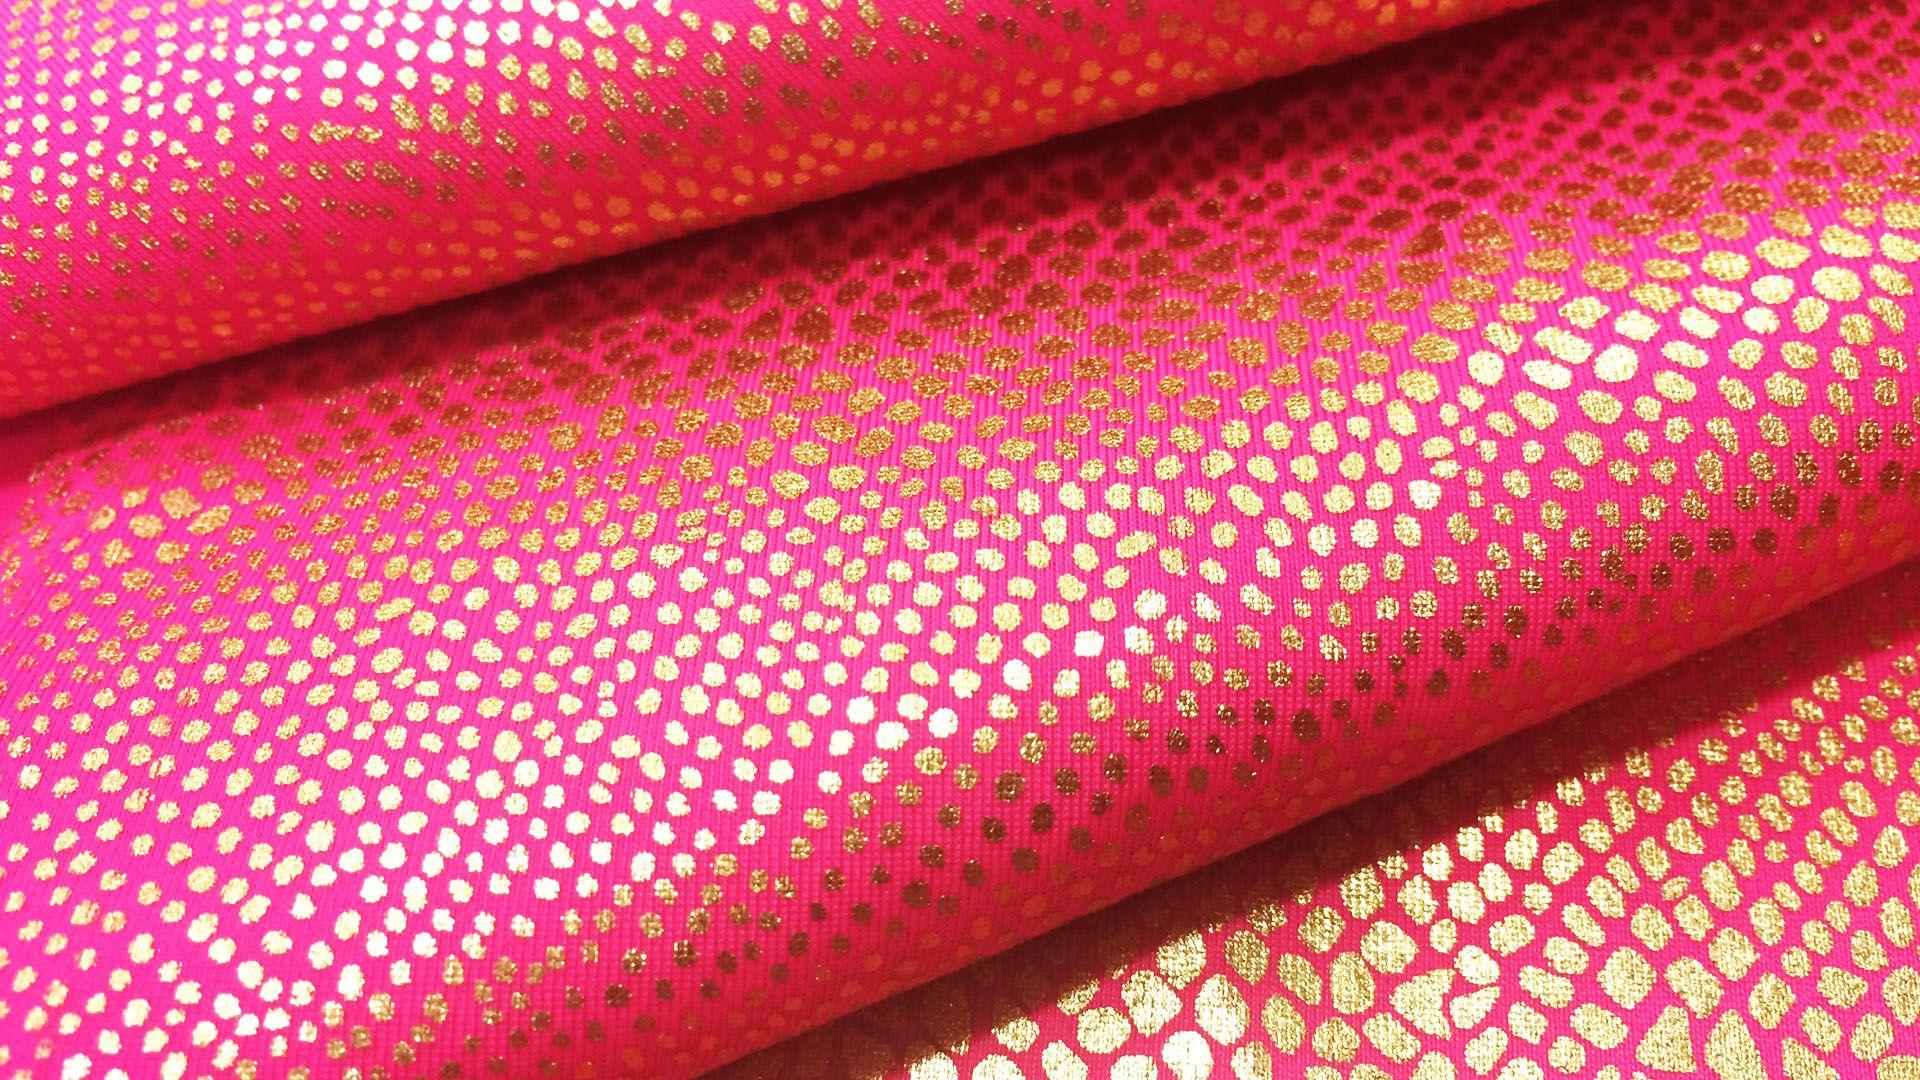 Tela Metalizada Fucsia Animal Print Nylon Lycra Spandex 4 Way Stretch Por Metro